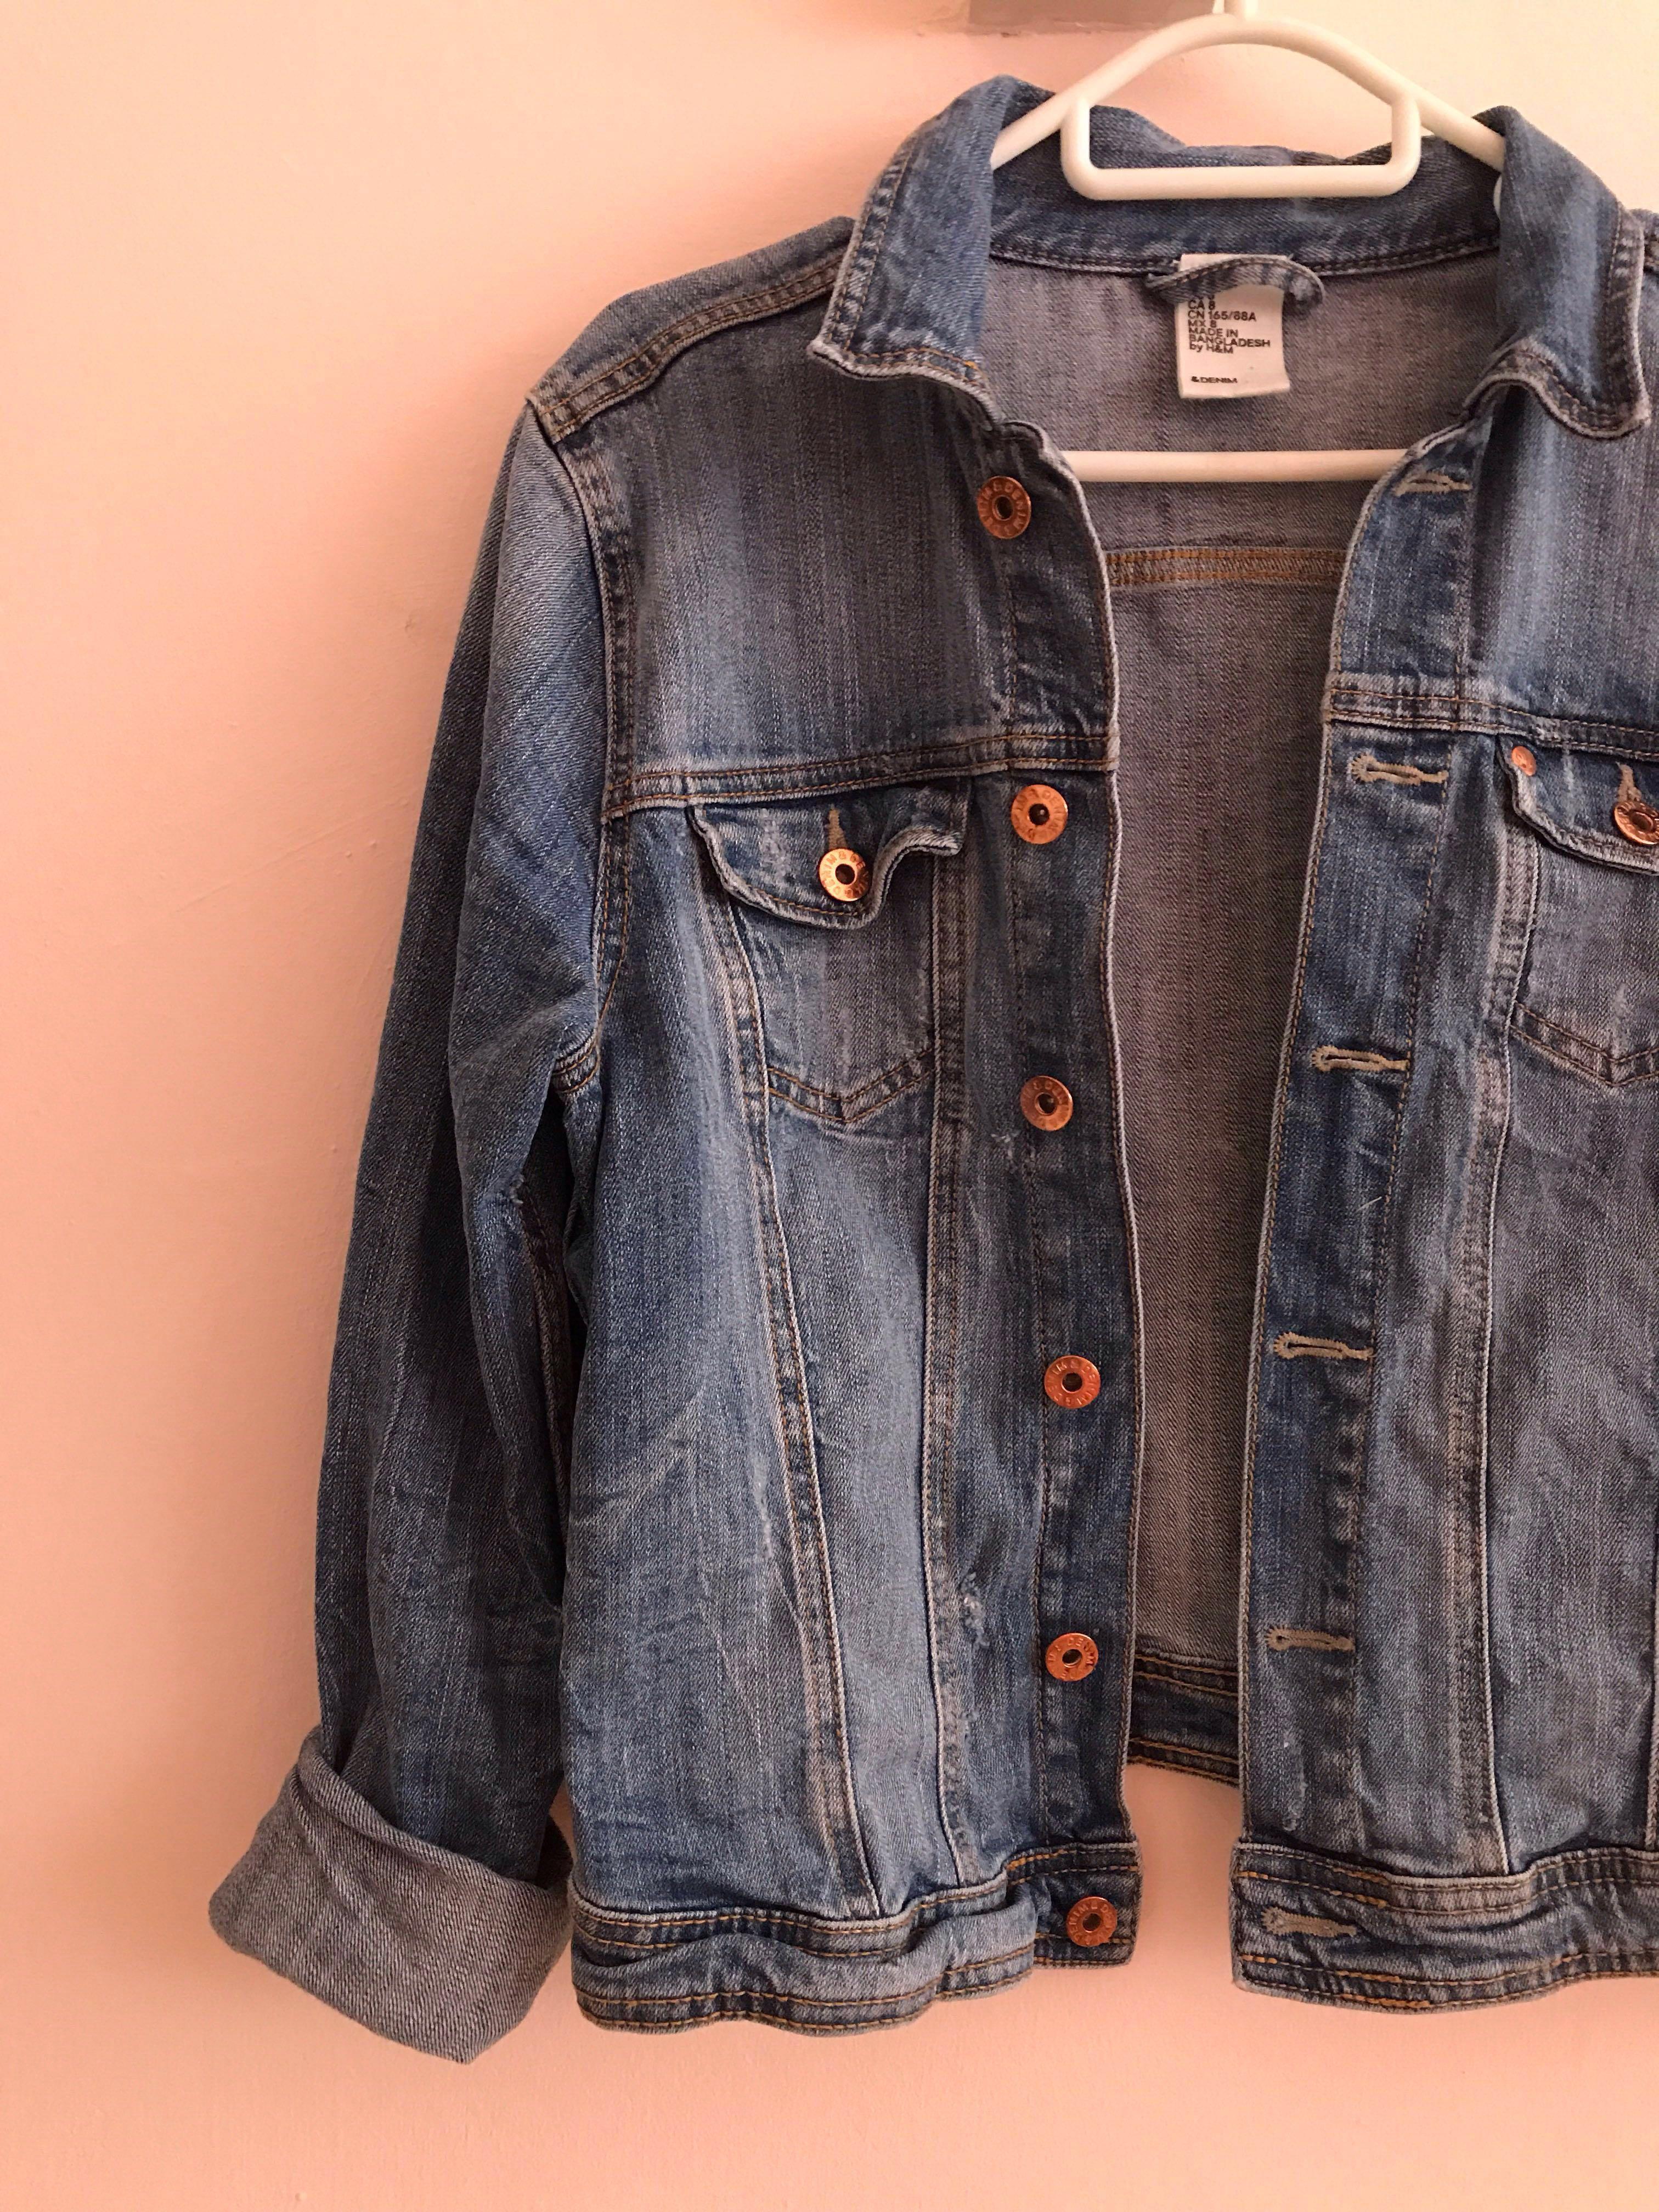 955a4f51a18 H M Denim Jacket